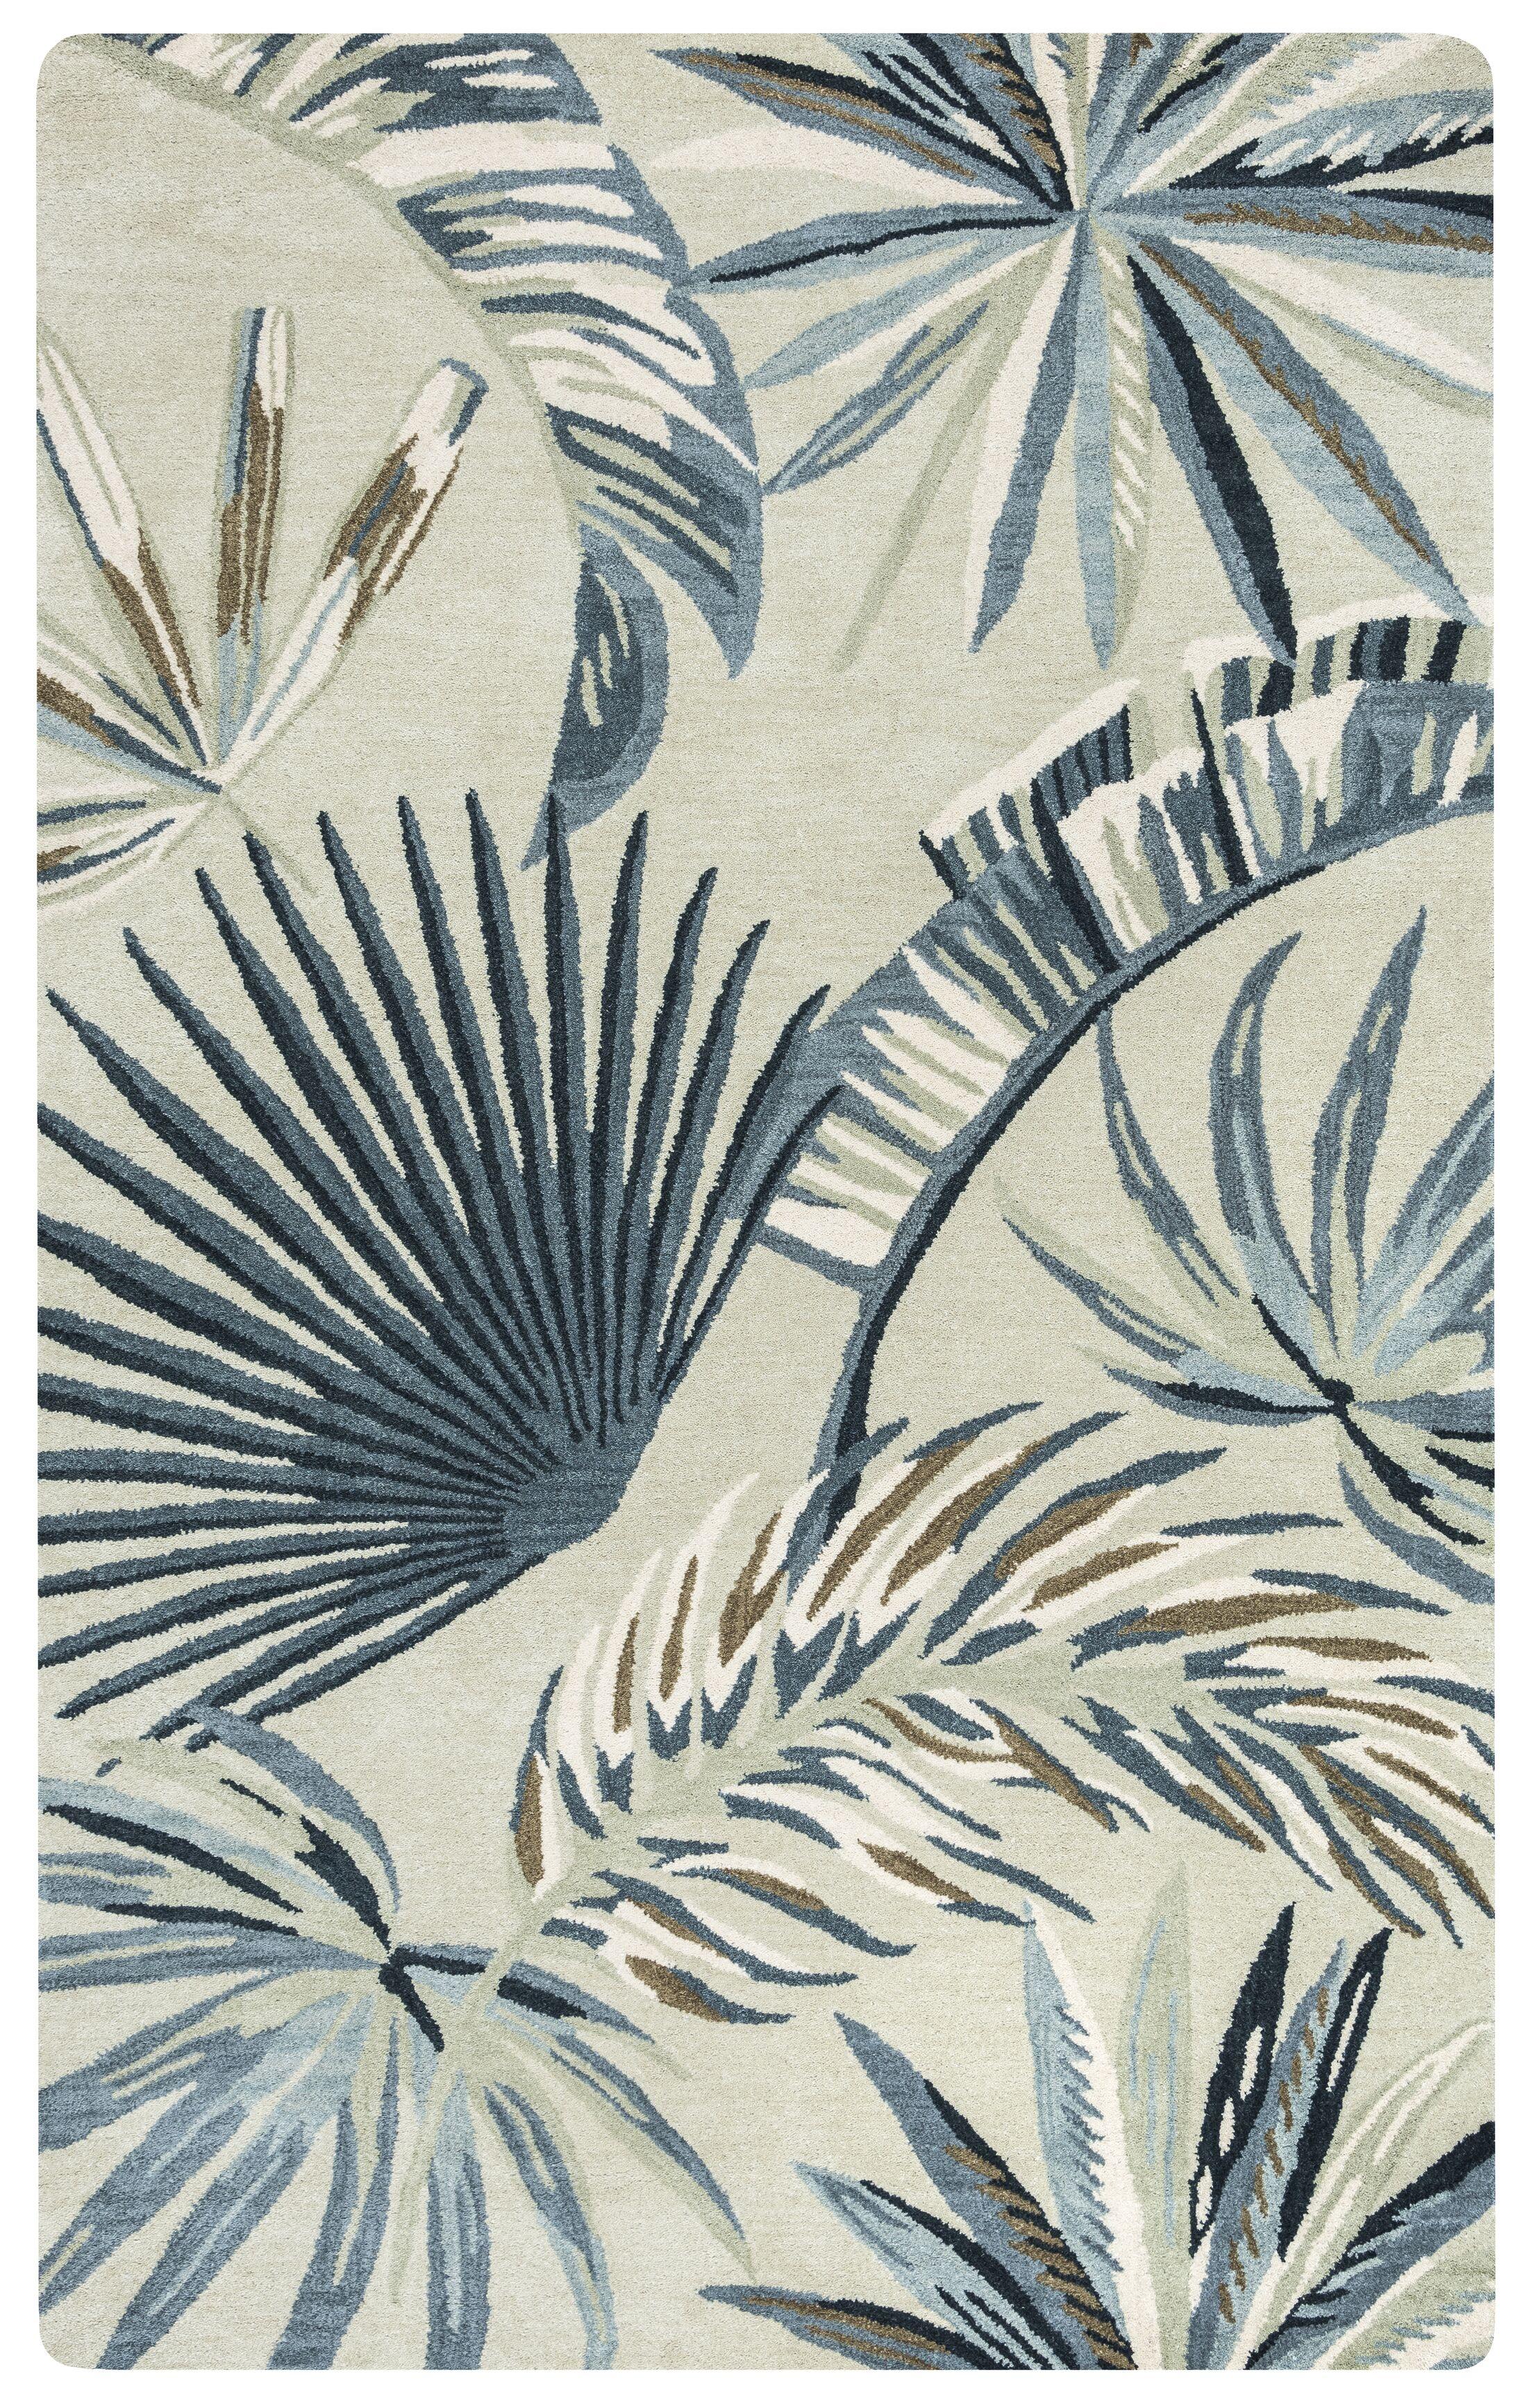 Minnie Hand-Tufted Khaki Area Rug Rug Size: Rectangle 5' x 8'